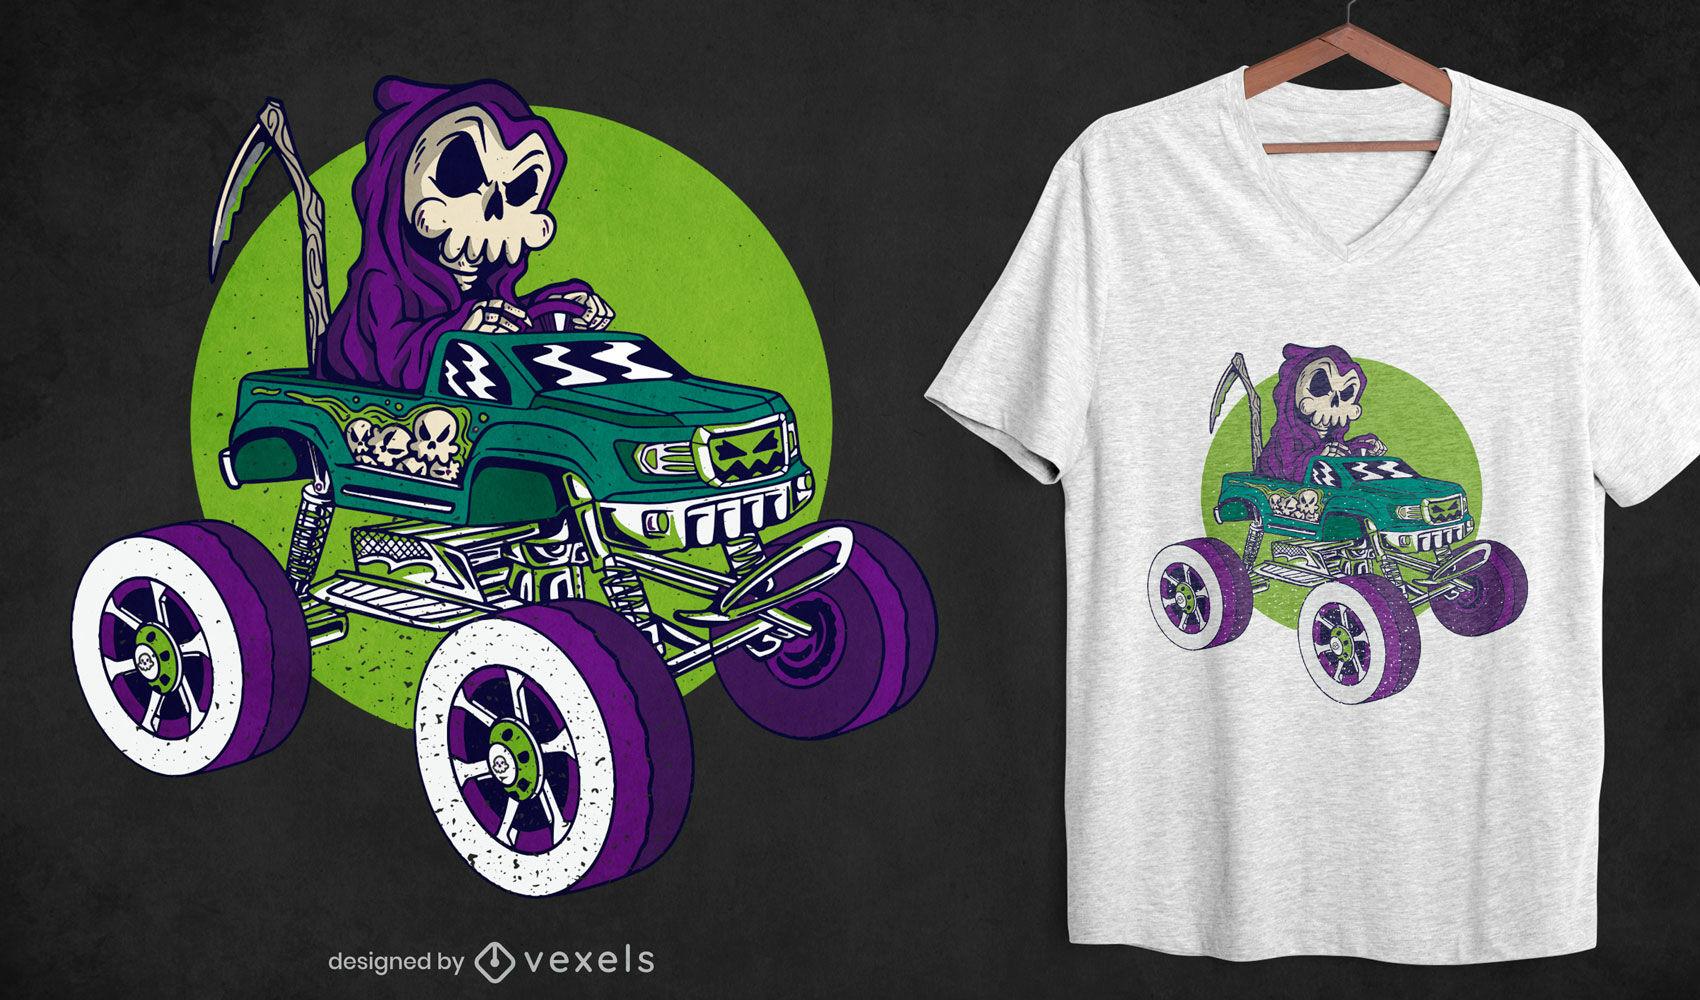 Grim reaper in monster truck t-shirt design